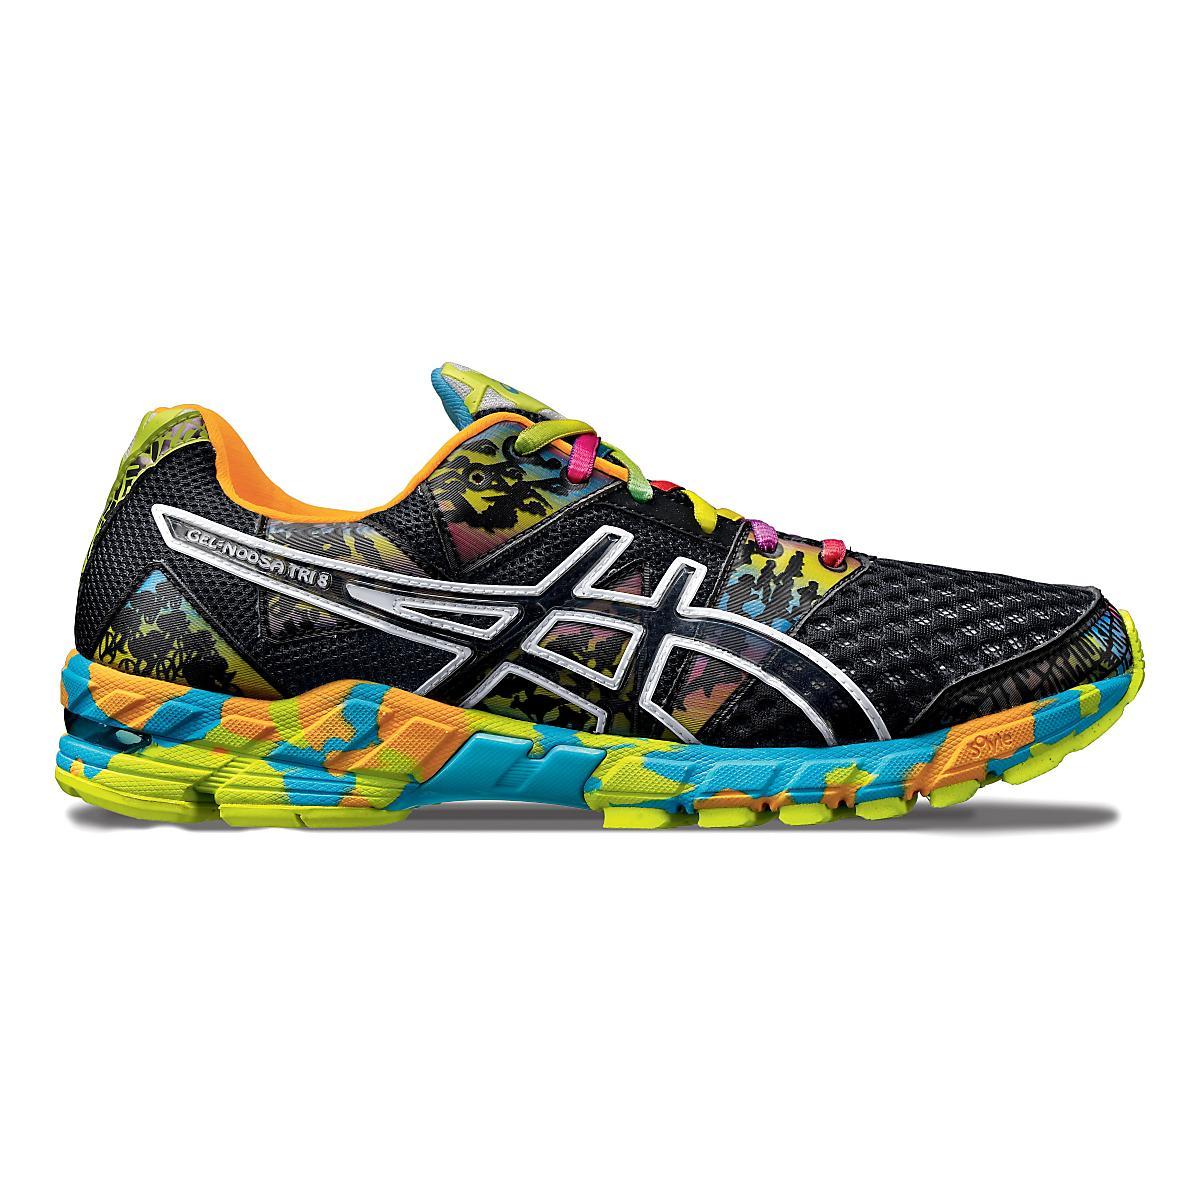 1fc667117c4a get mens asics gel noosa tri 8 running shoe at road runner sports 91796  0bacb